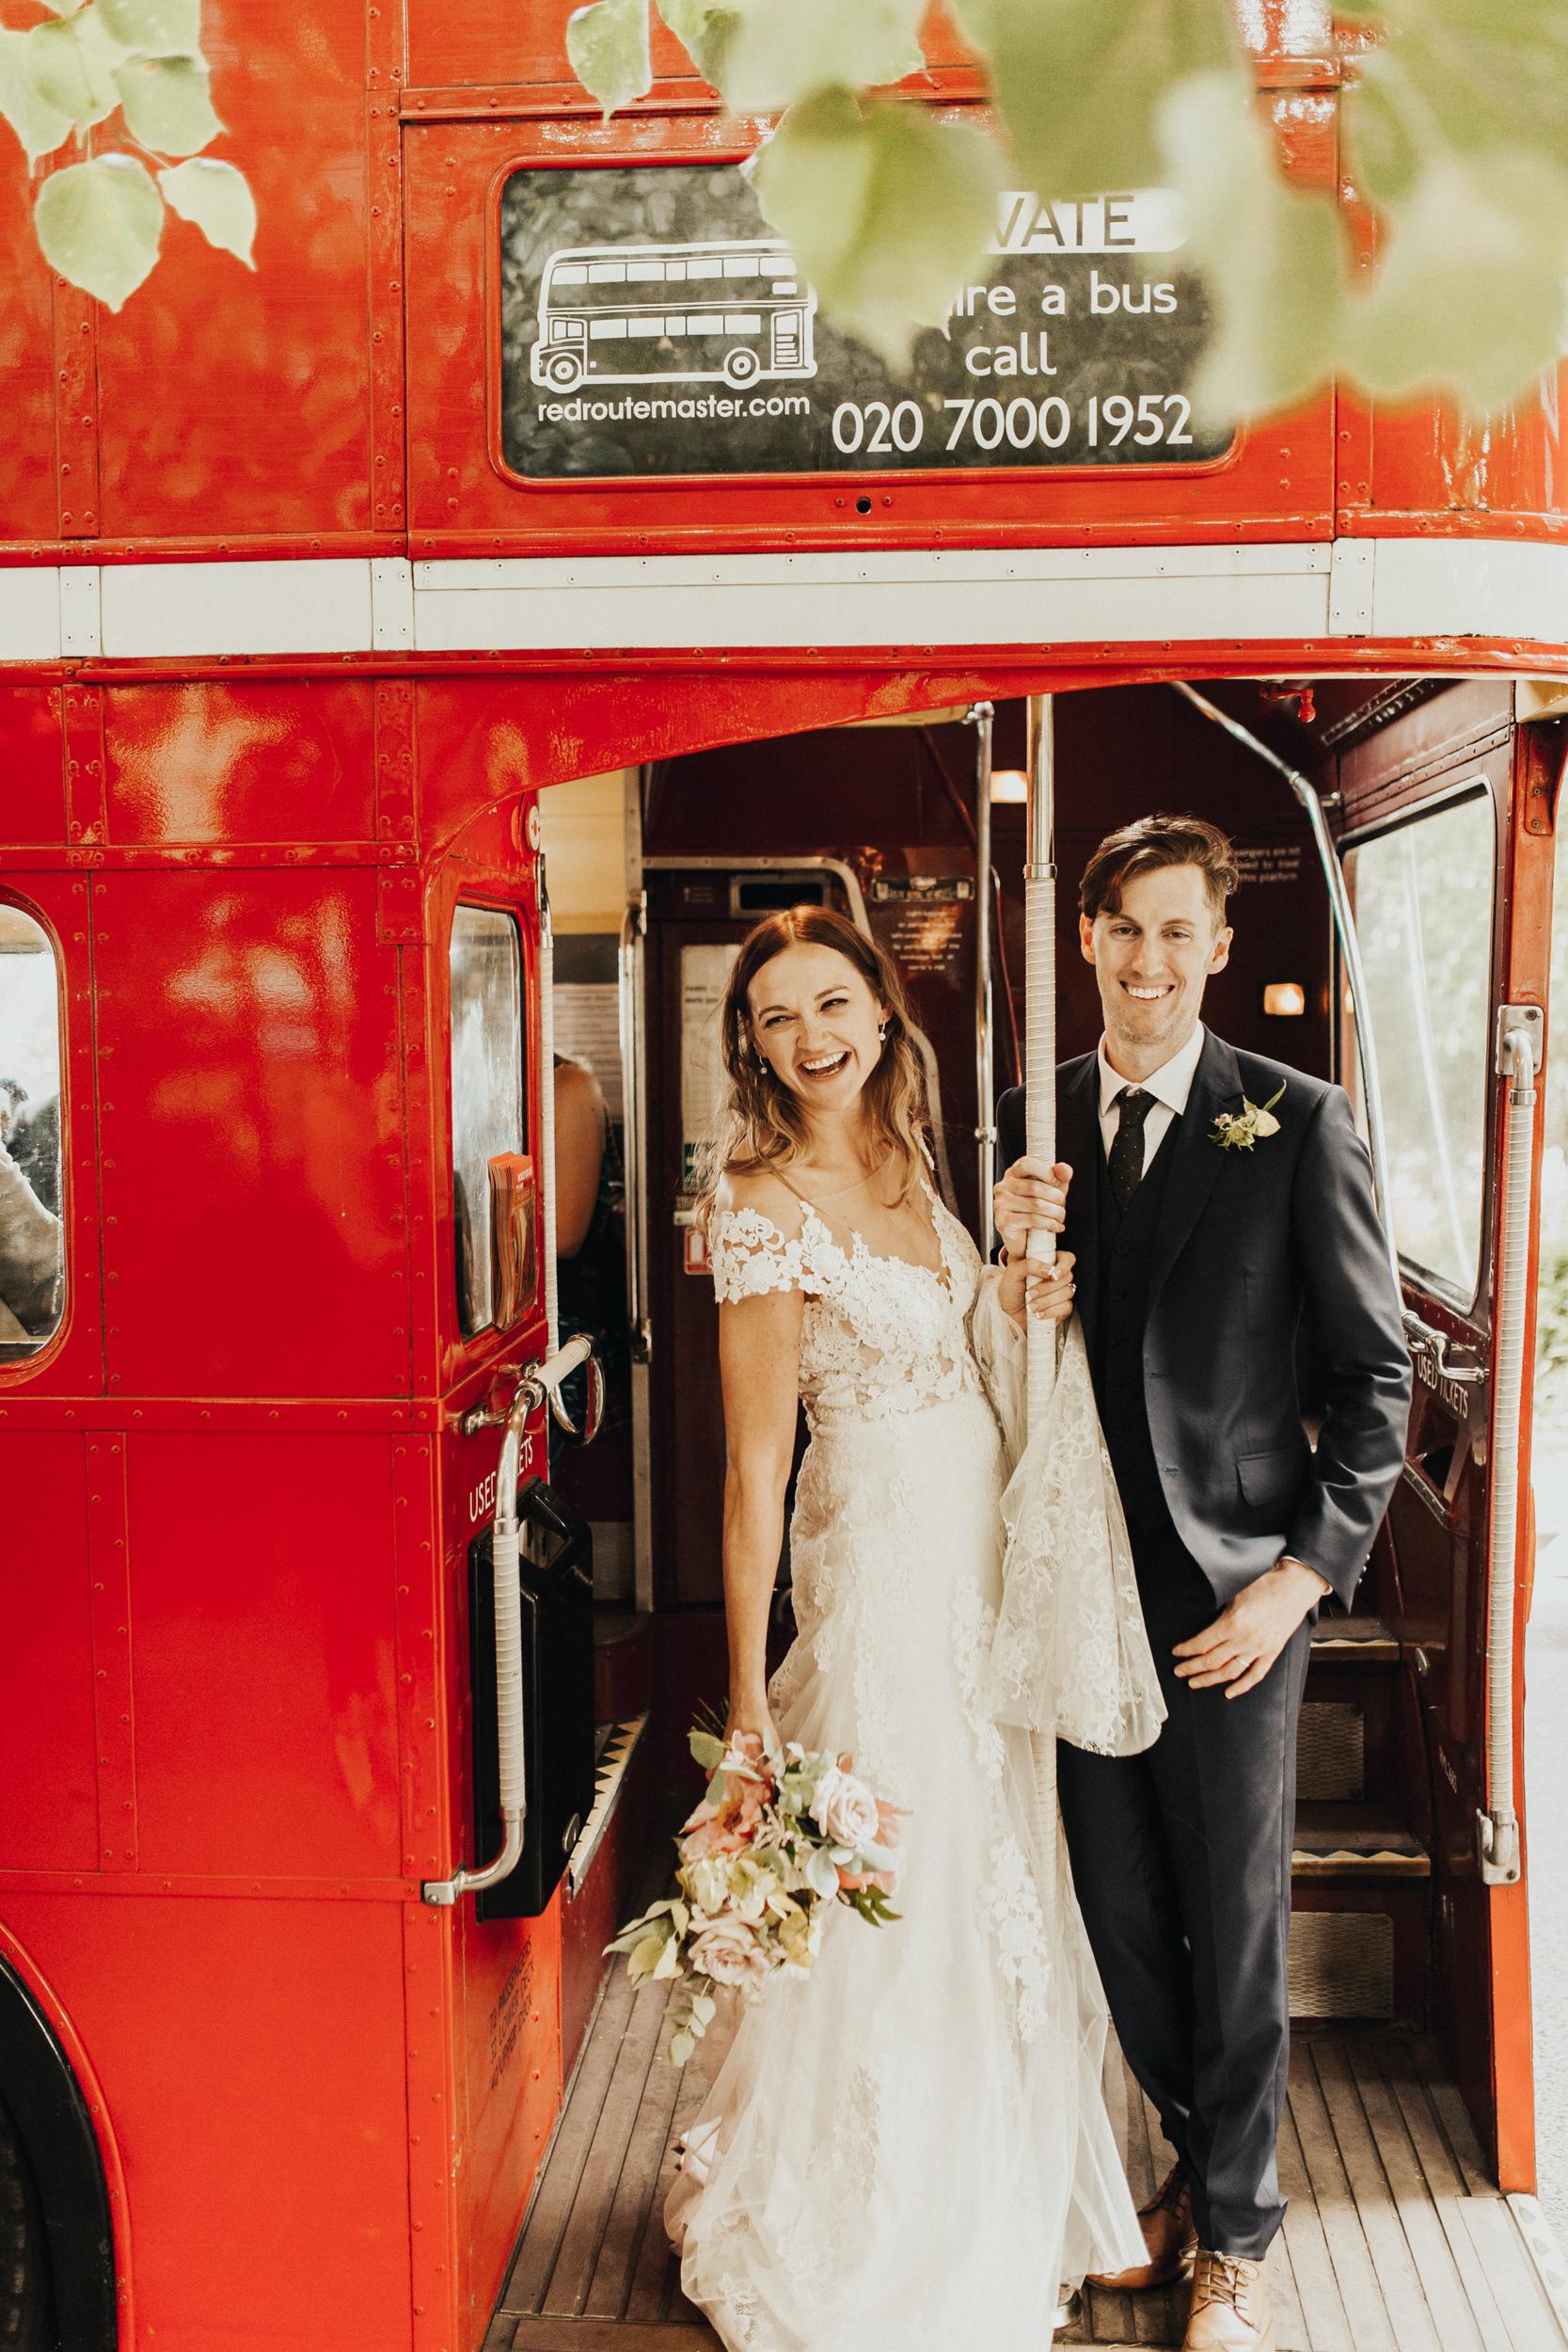 Laura-Benn-The-Asylum-London-The-Ace-Hotel-Wedding-Alternative-Darina-Stoda-Photography-472.jpg